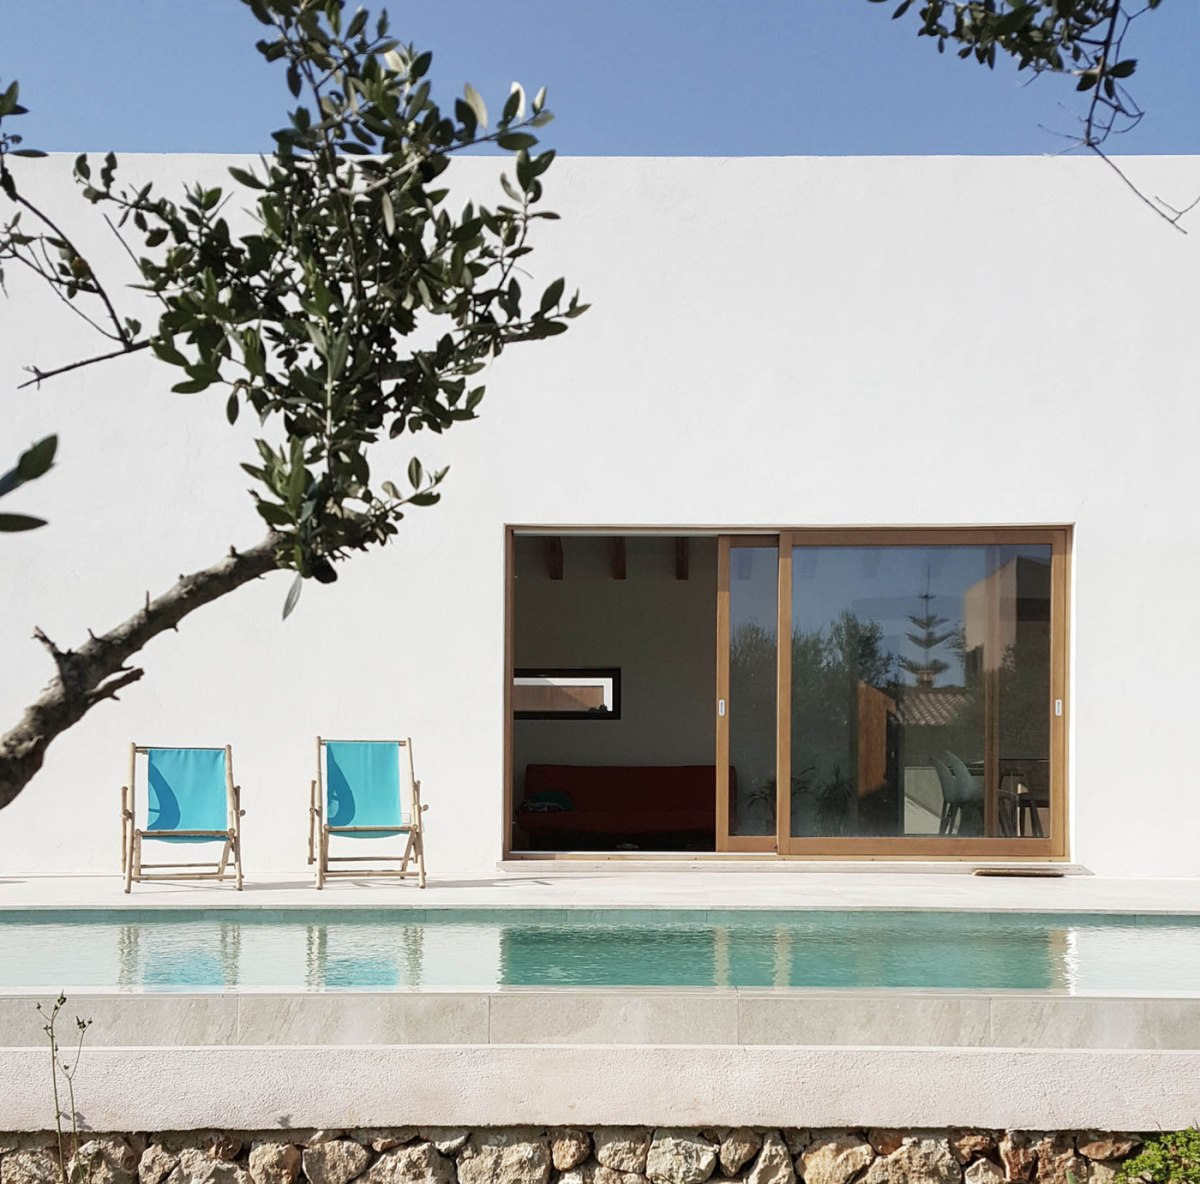 PI House by Munarqarchitects